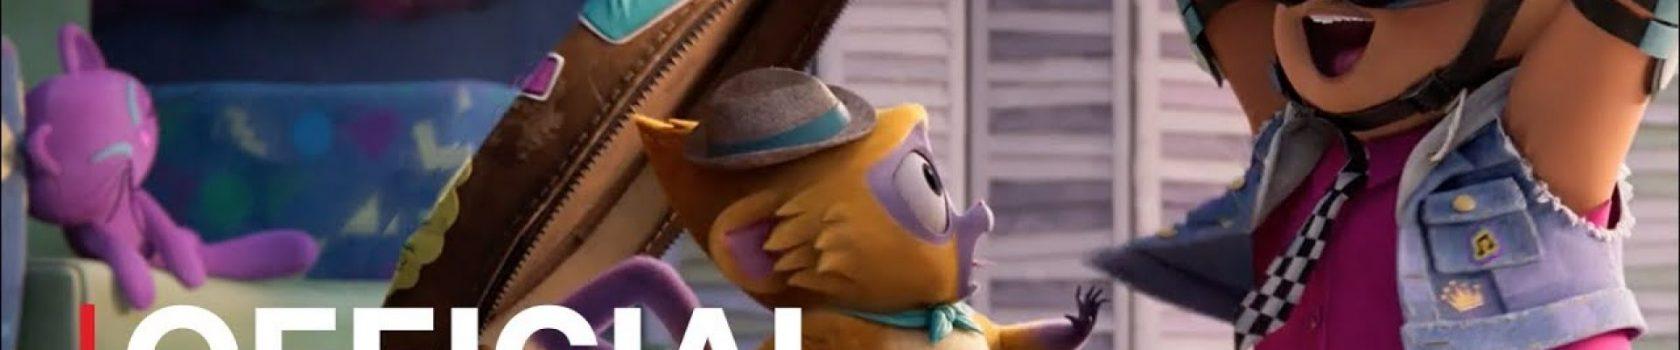 Vivo, Sony and Netflix keeps delivering against Pixar